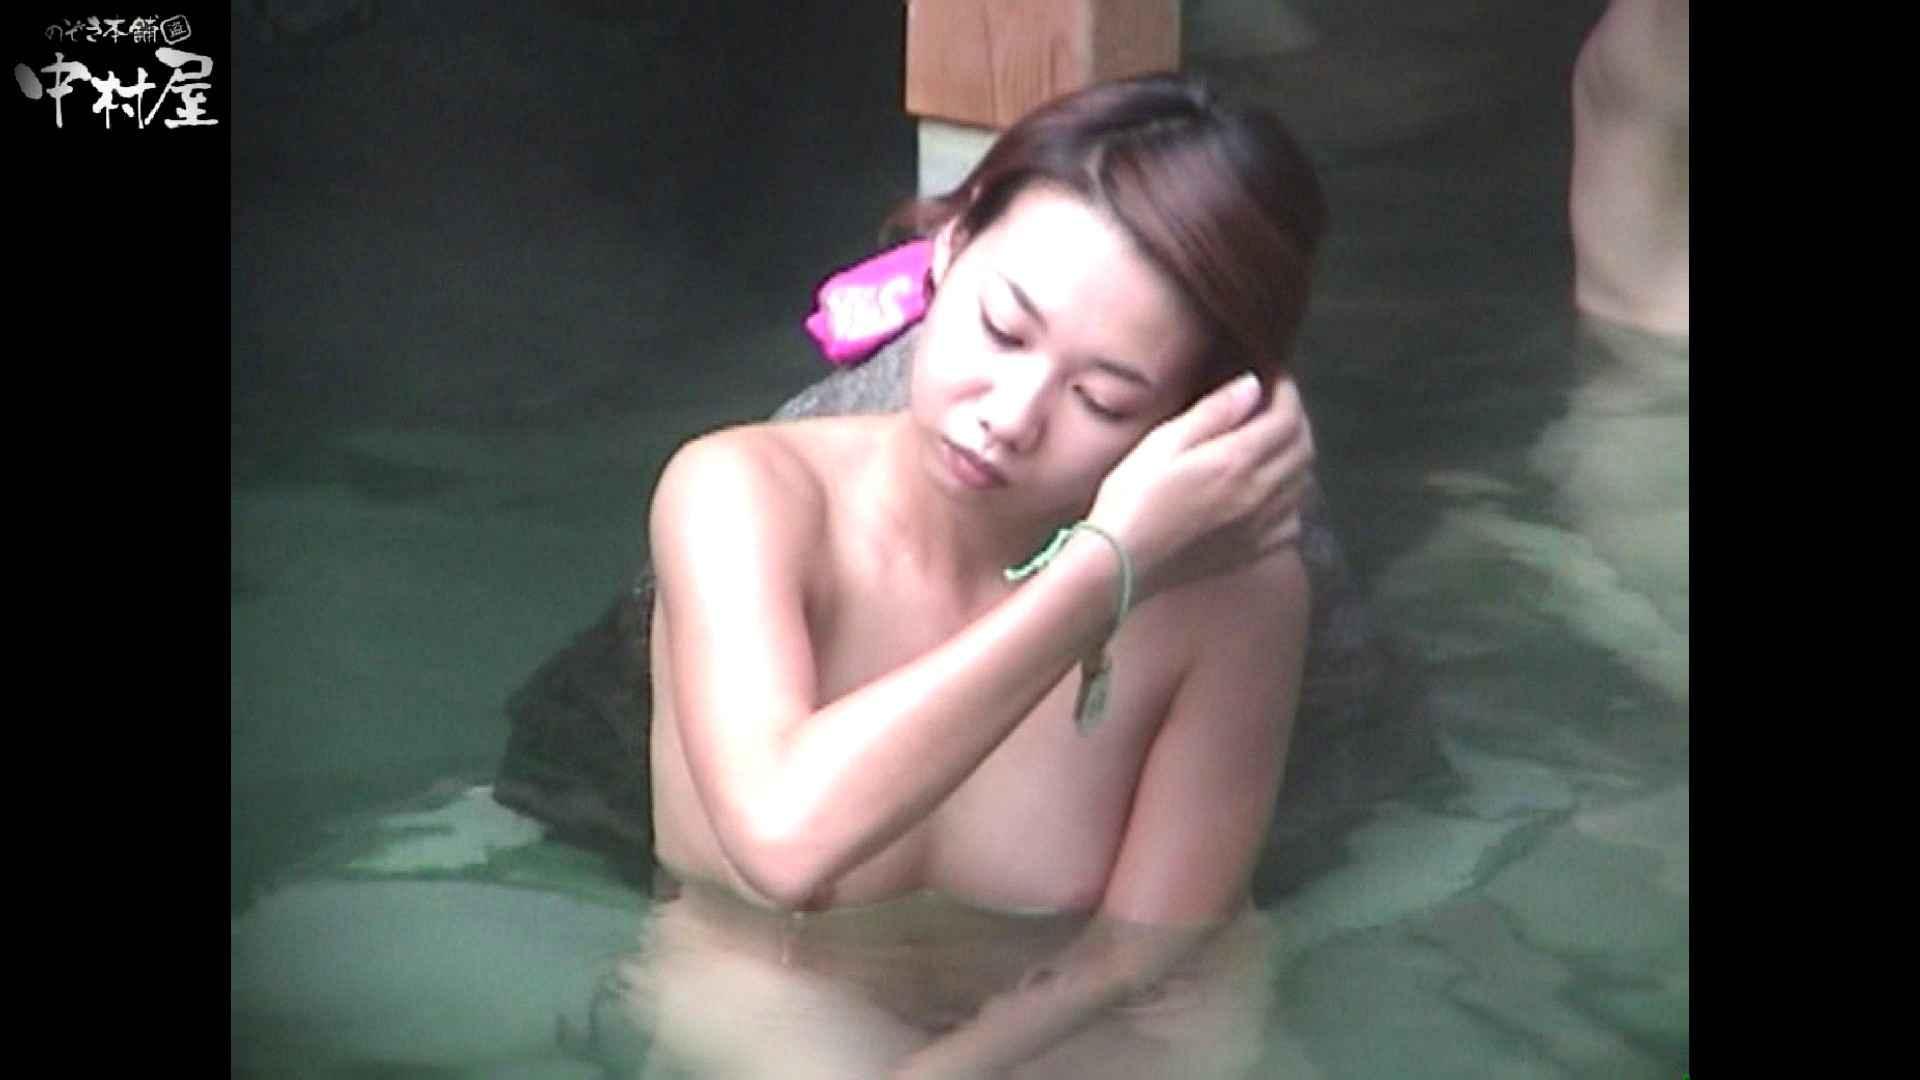 Aquaな露天風呂Vol.951 盗撮映像  93Pix 92